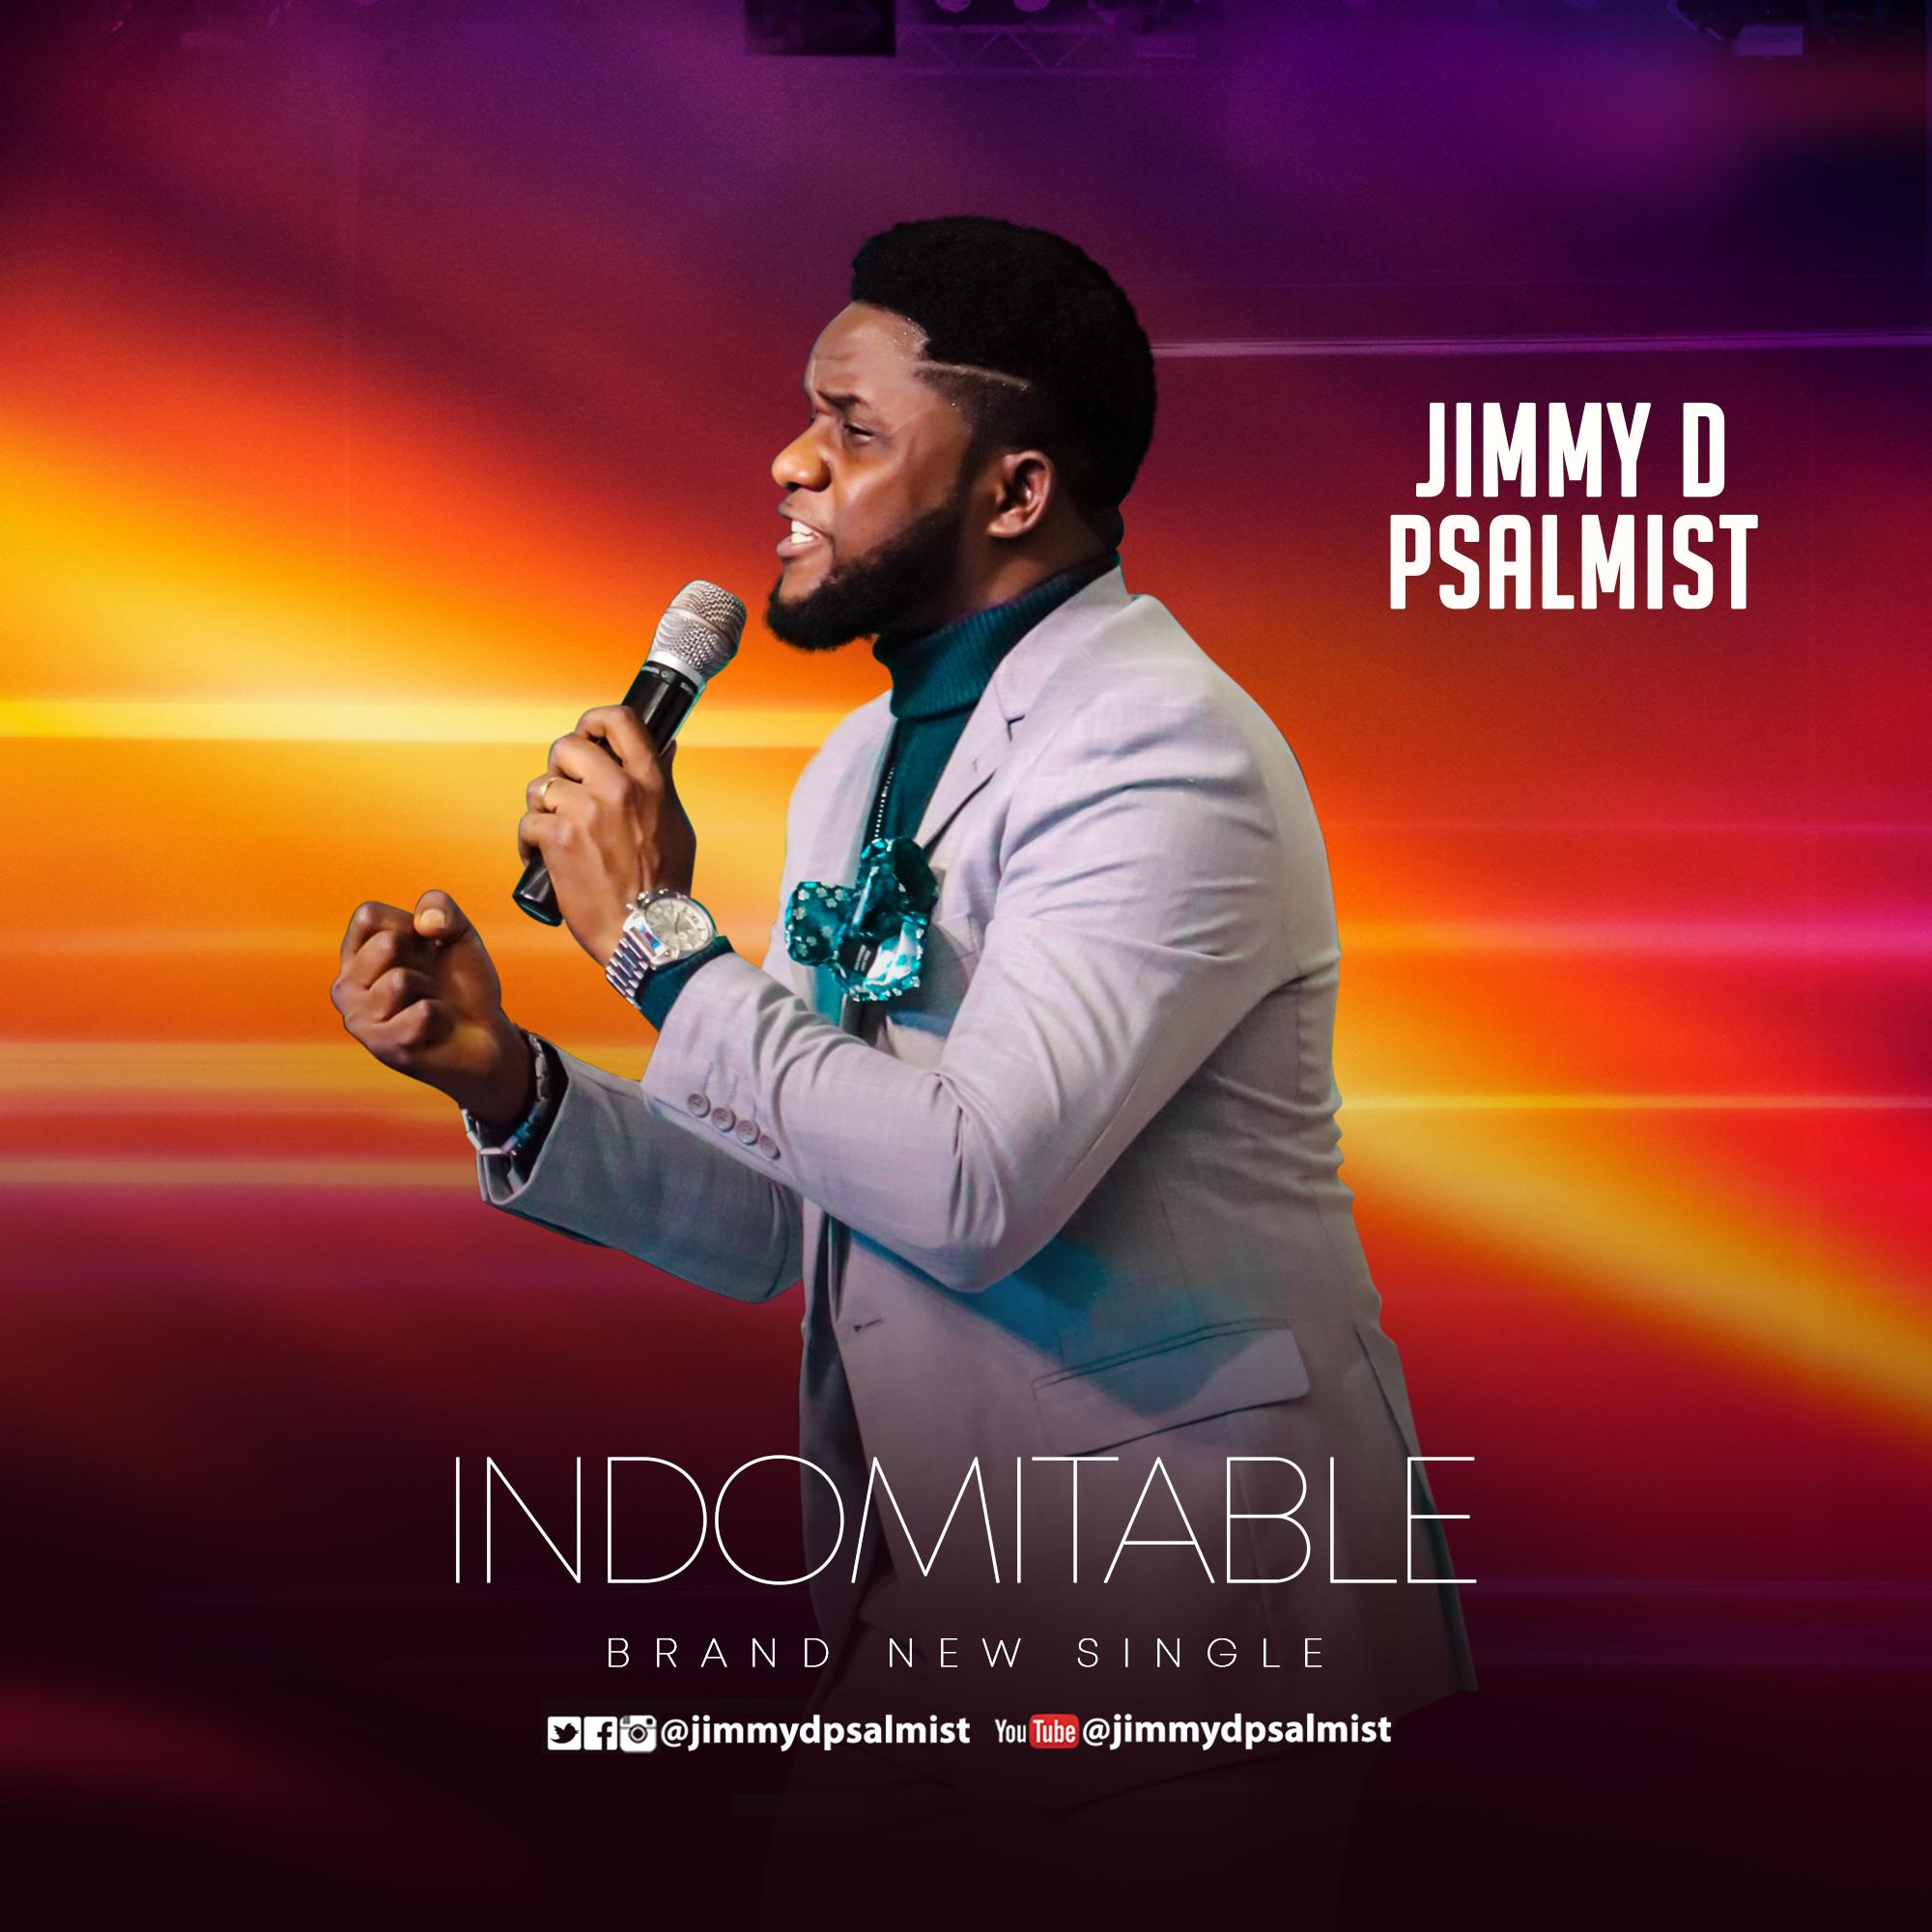 DOWNLOAD: Jimmy D Psalmist - Indomitable [Mp3 + Video]